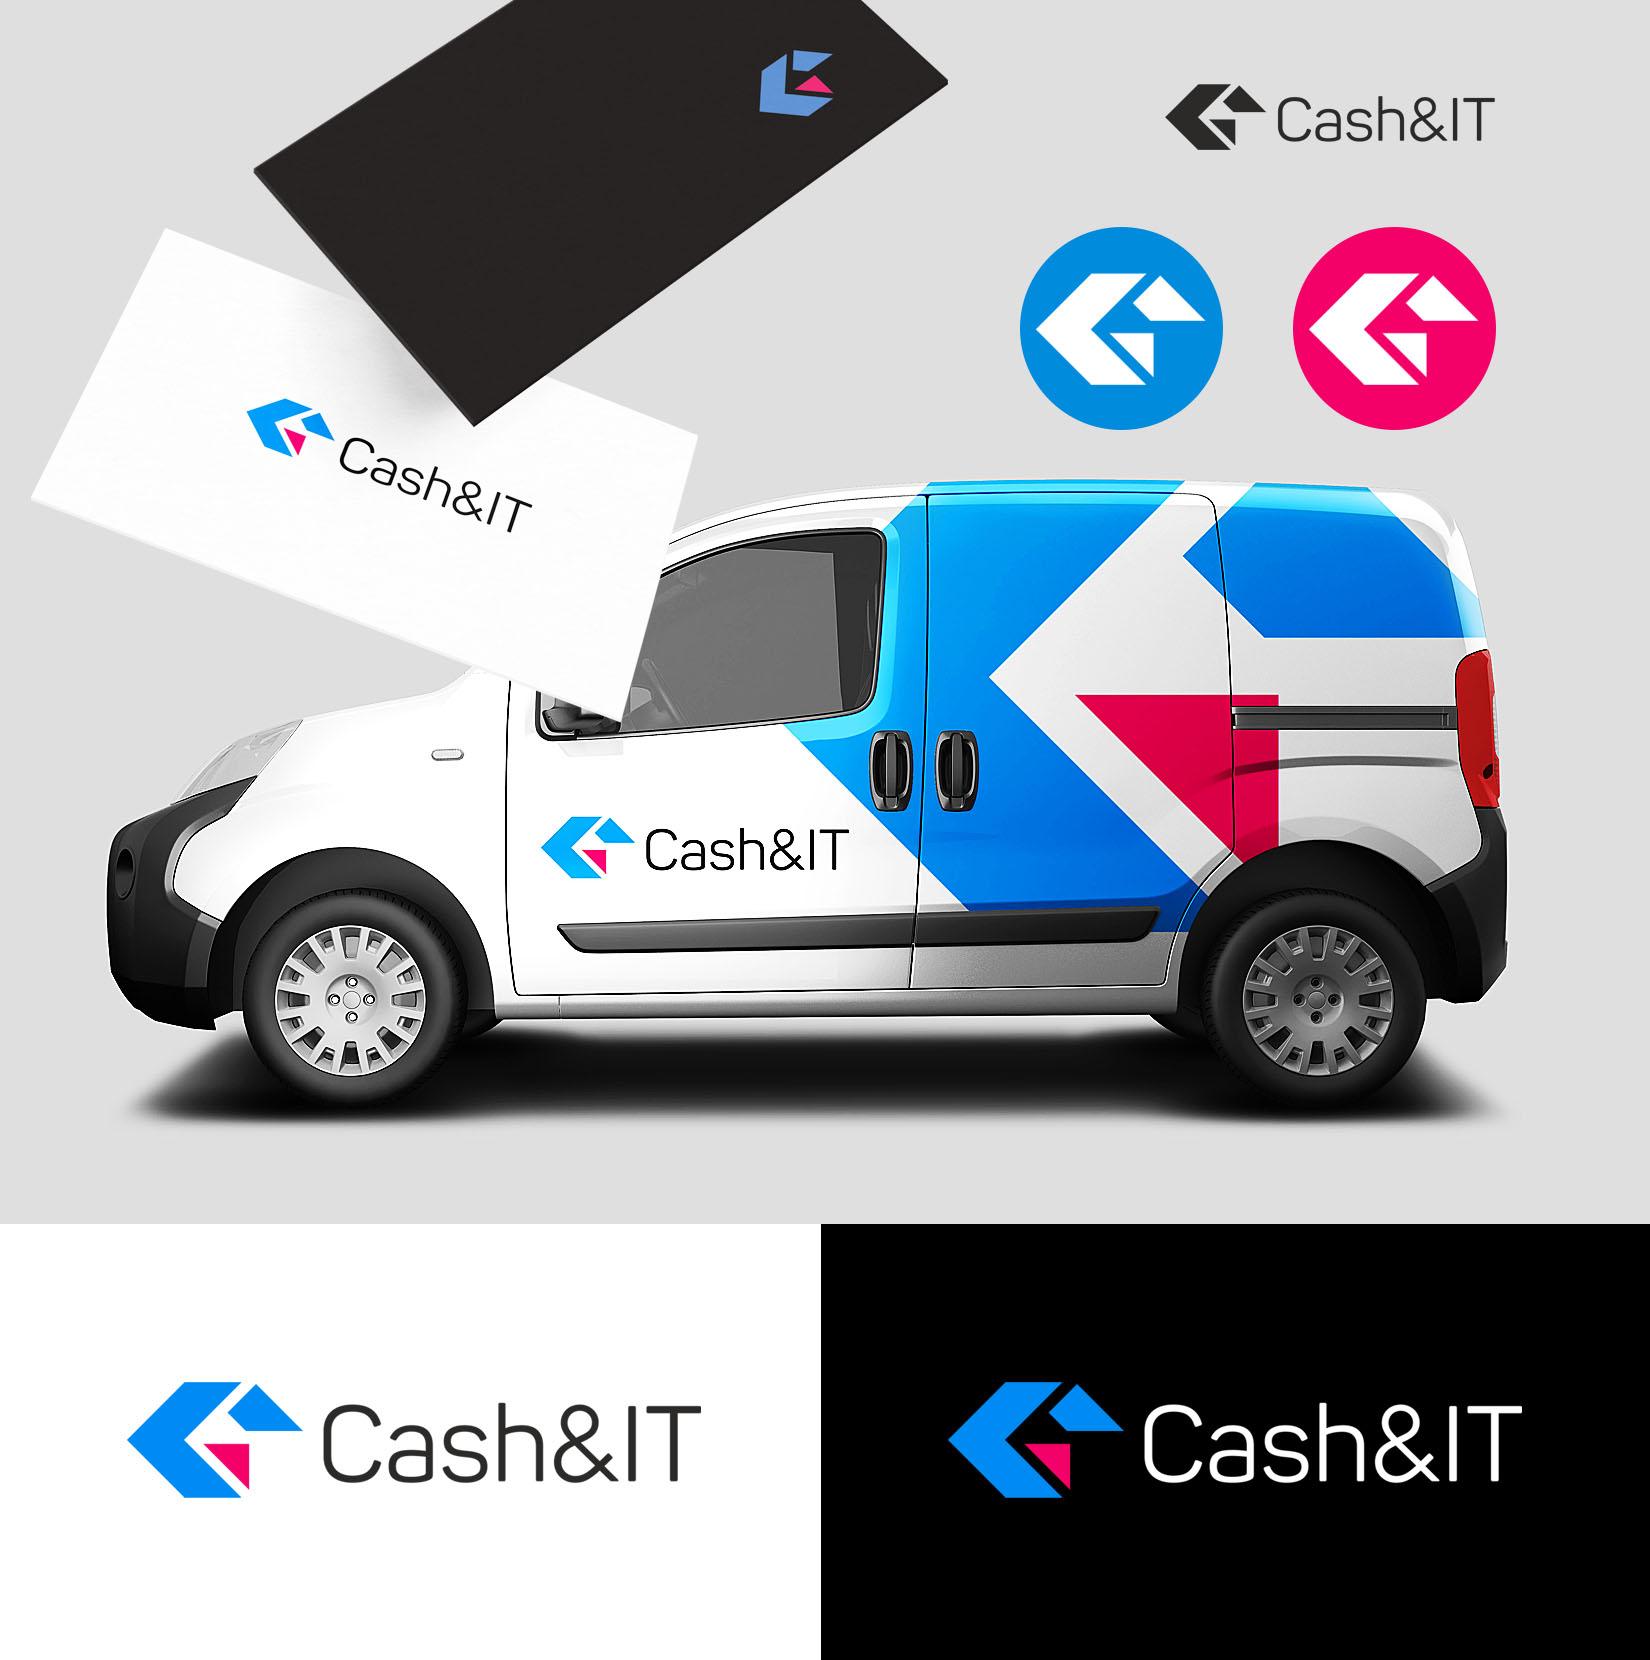 Логотип для Cash & IT - сервис доставки денег фото f_7725fd9f07d32554.jpg